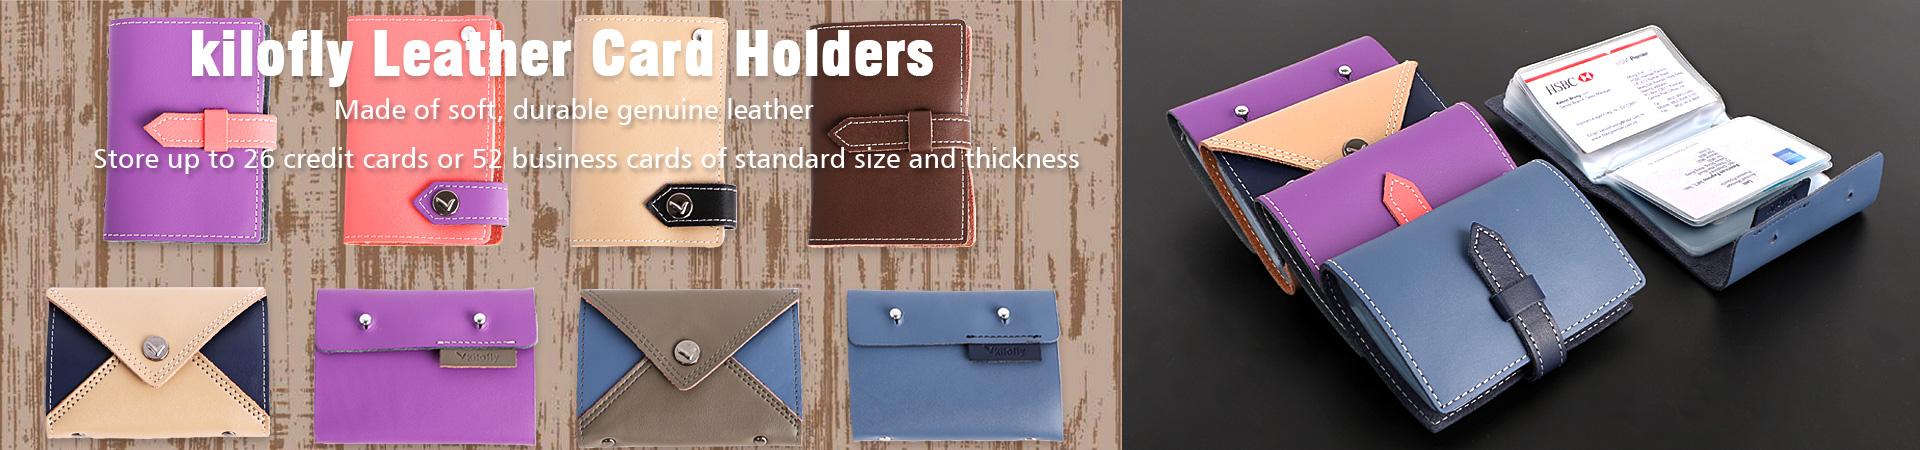 kilofly leather card holders